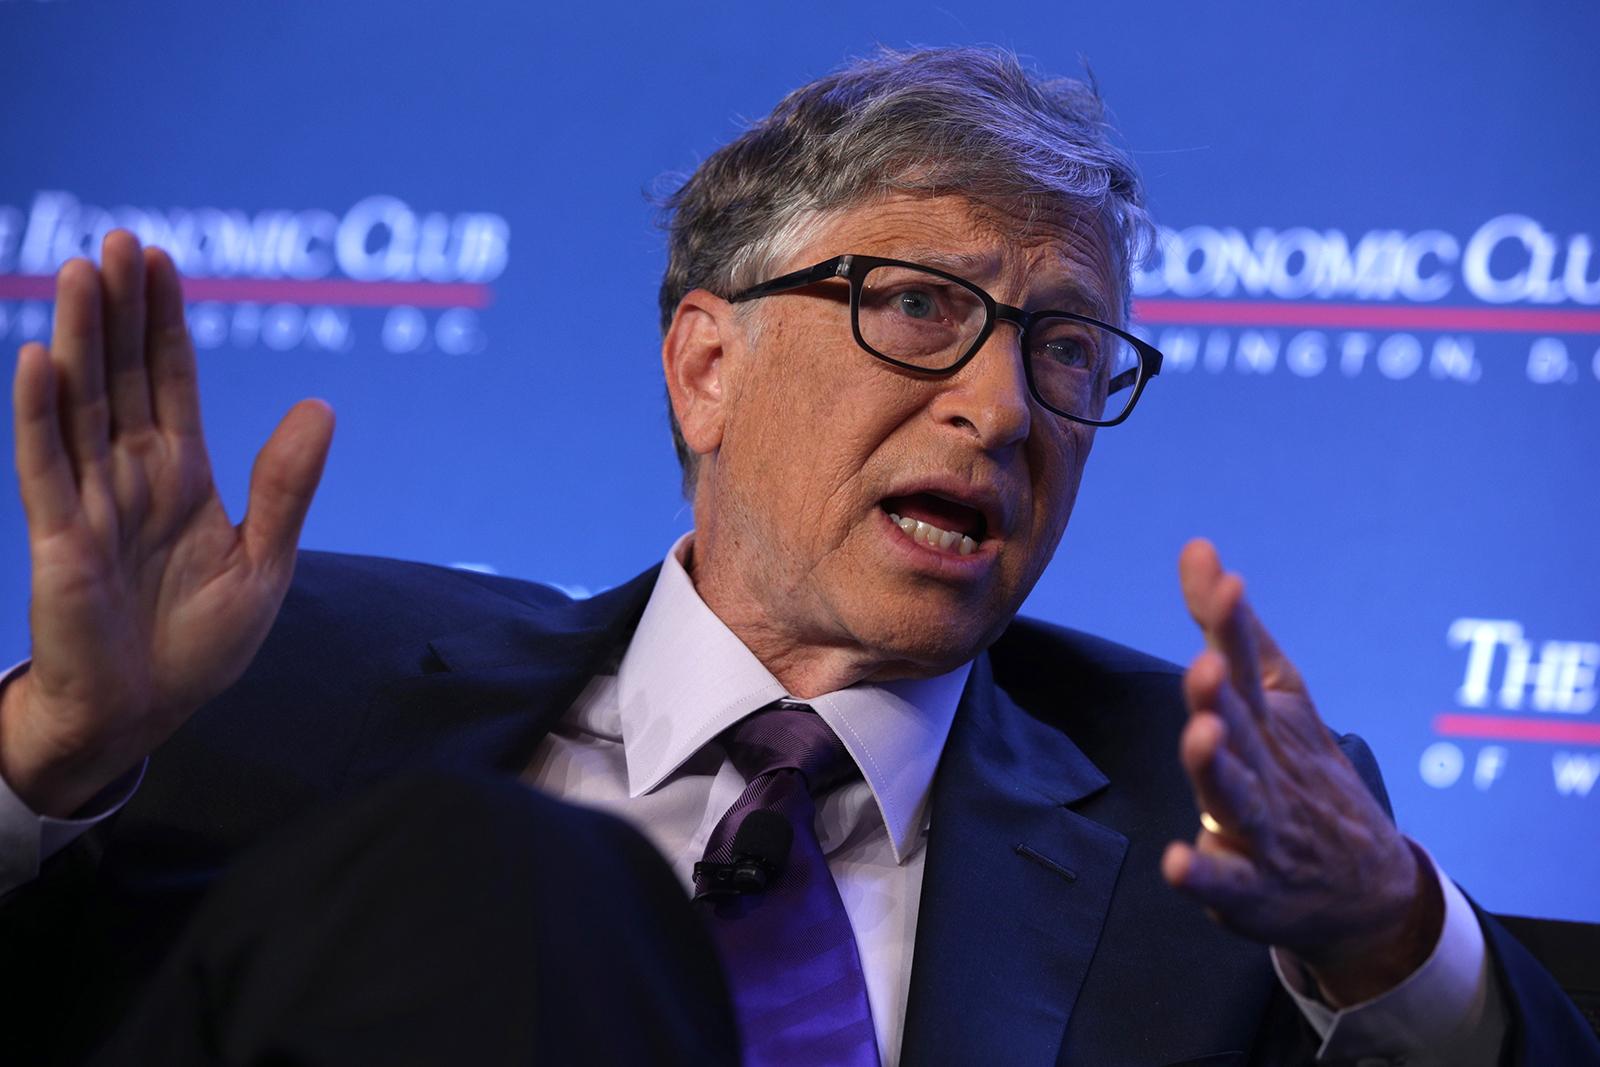 Microsoft principle founder Bill Gates participates in a discussion at the Economic Club of Washington, in Washington, DC on June 24, 2019.